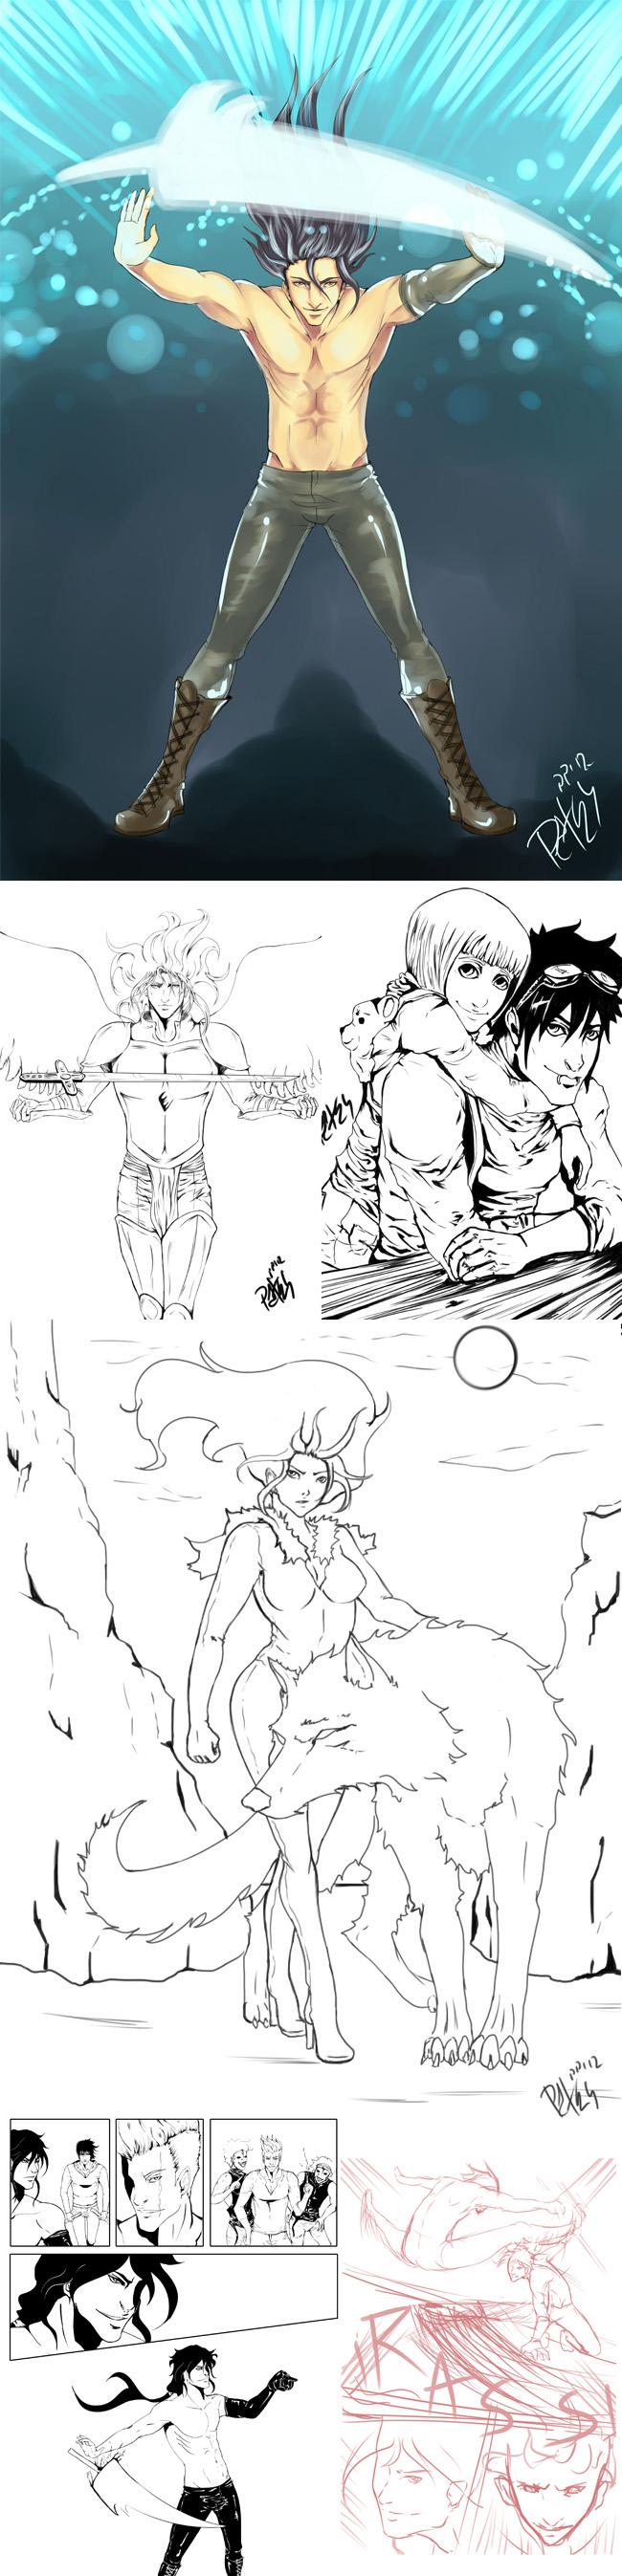 Manga-Patricia-Pastor-Madrid-Comic-Diana-Fernandez-Kosen